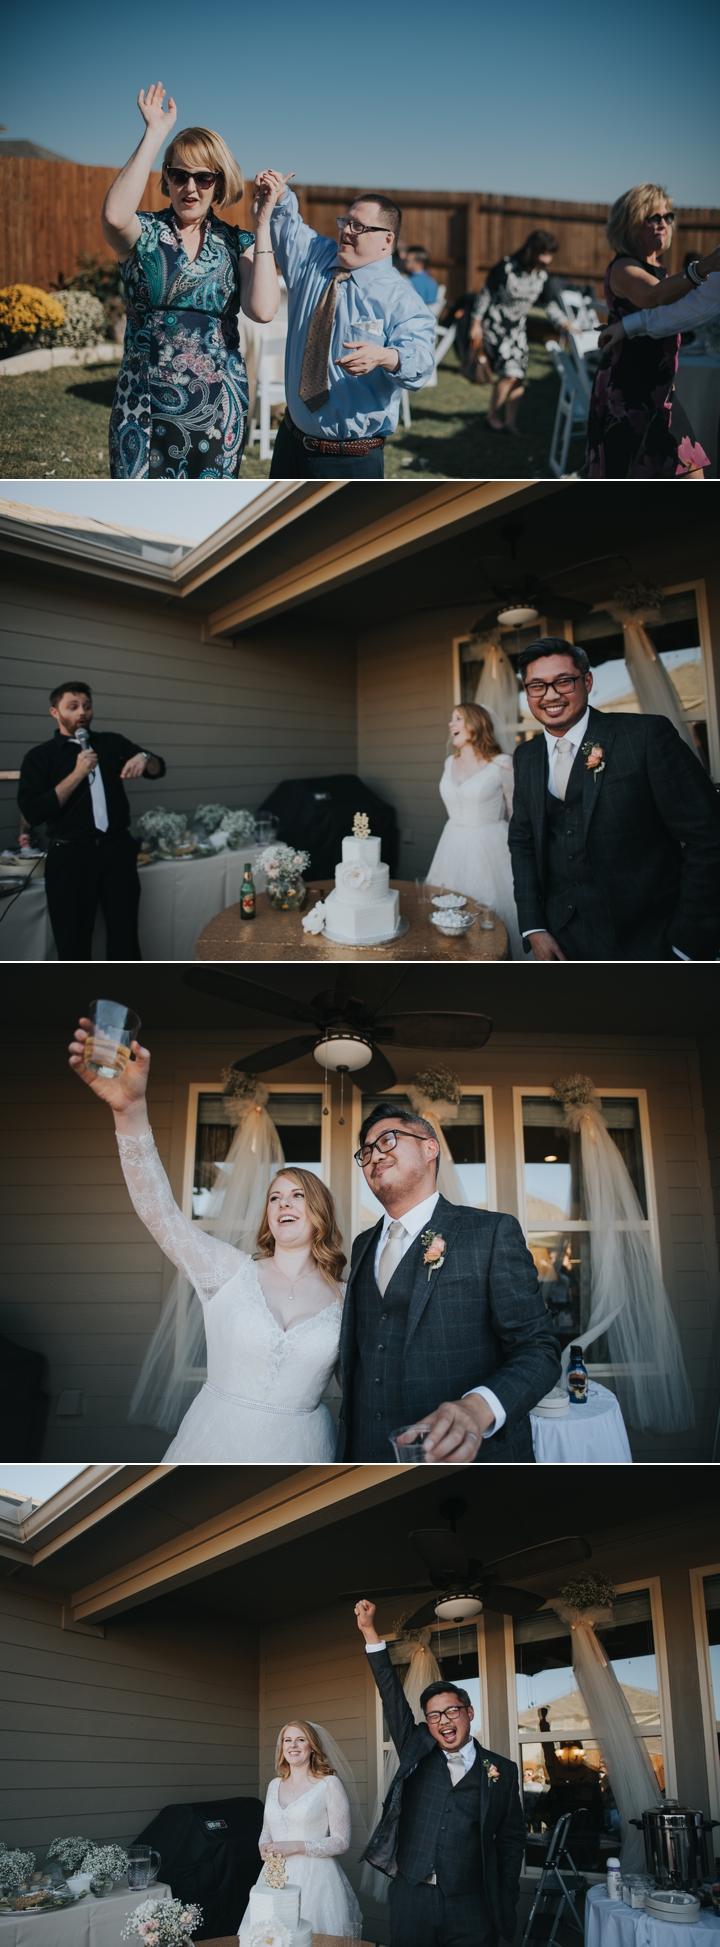 dallas-wedding-photographers-vb 14.jpg